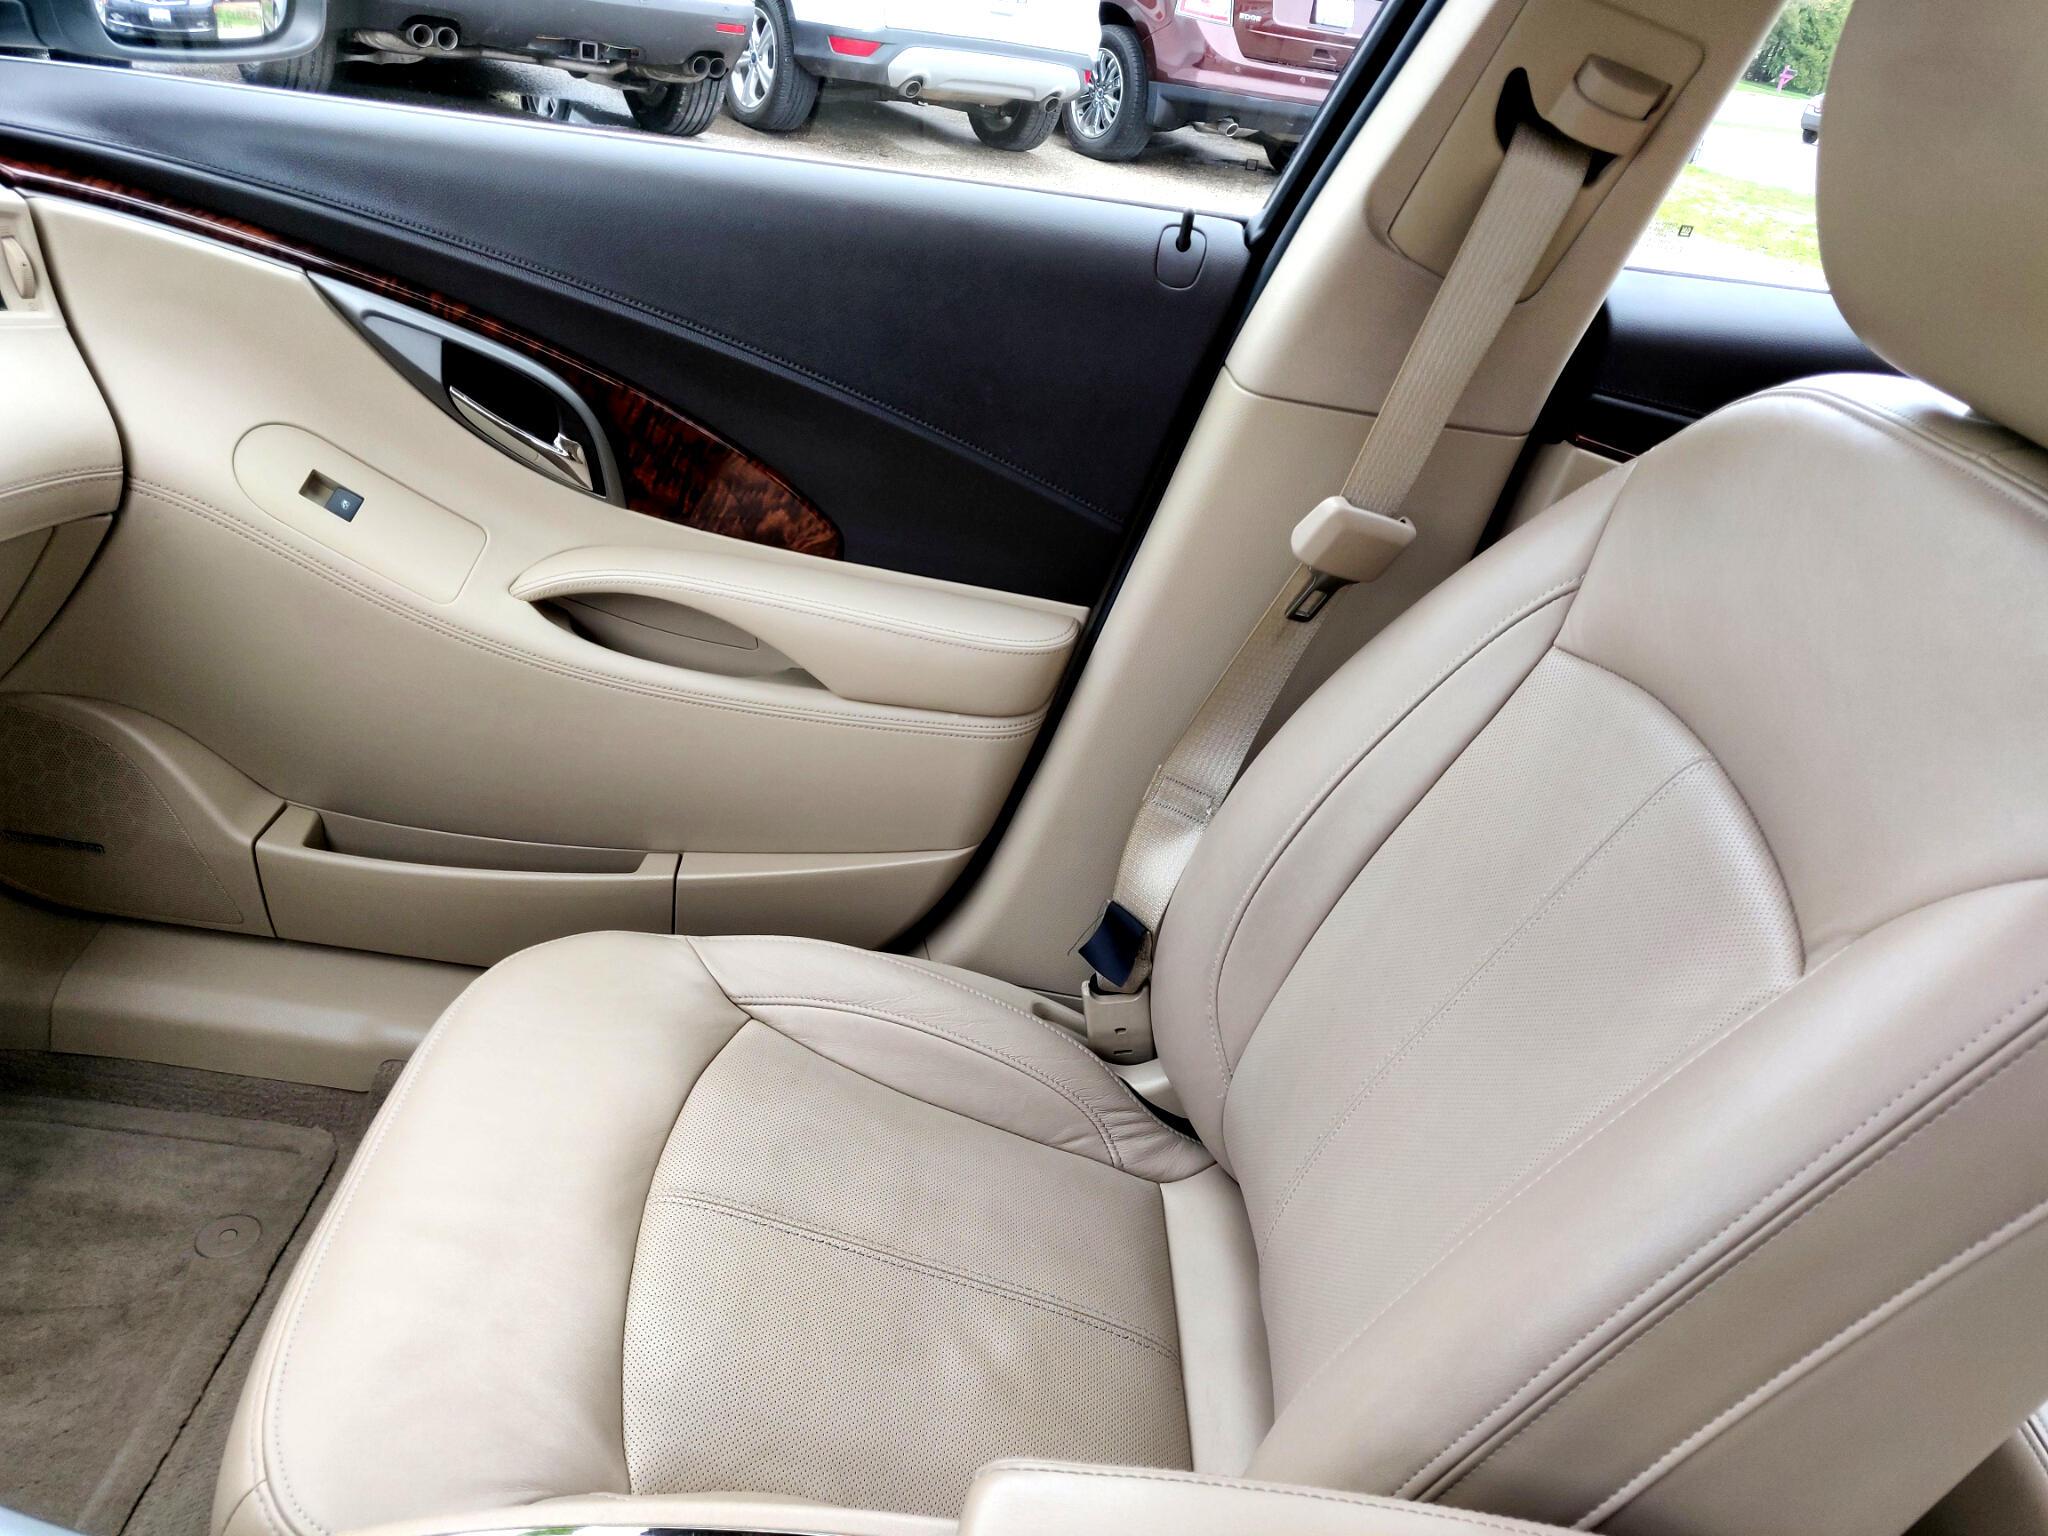 2012 Buick LaCrosse 4dr Sdn Premium 3 FWD